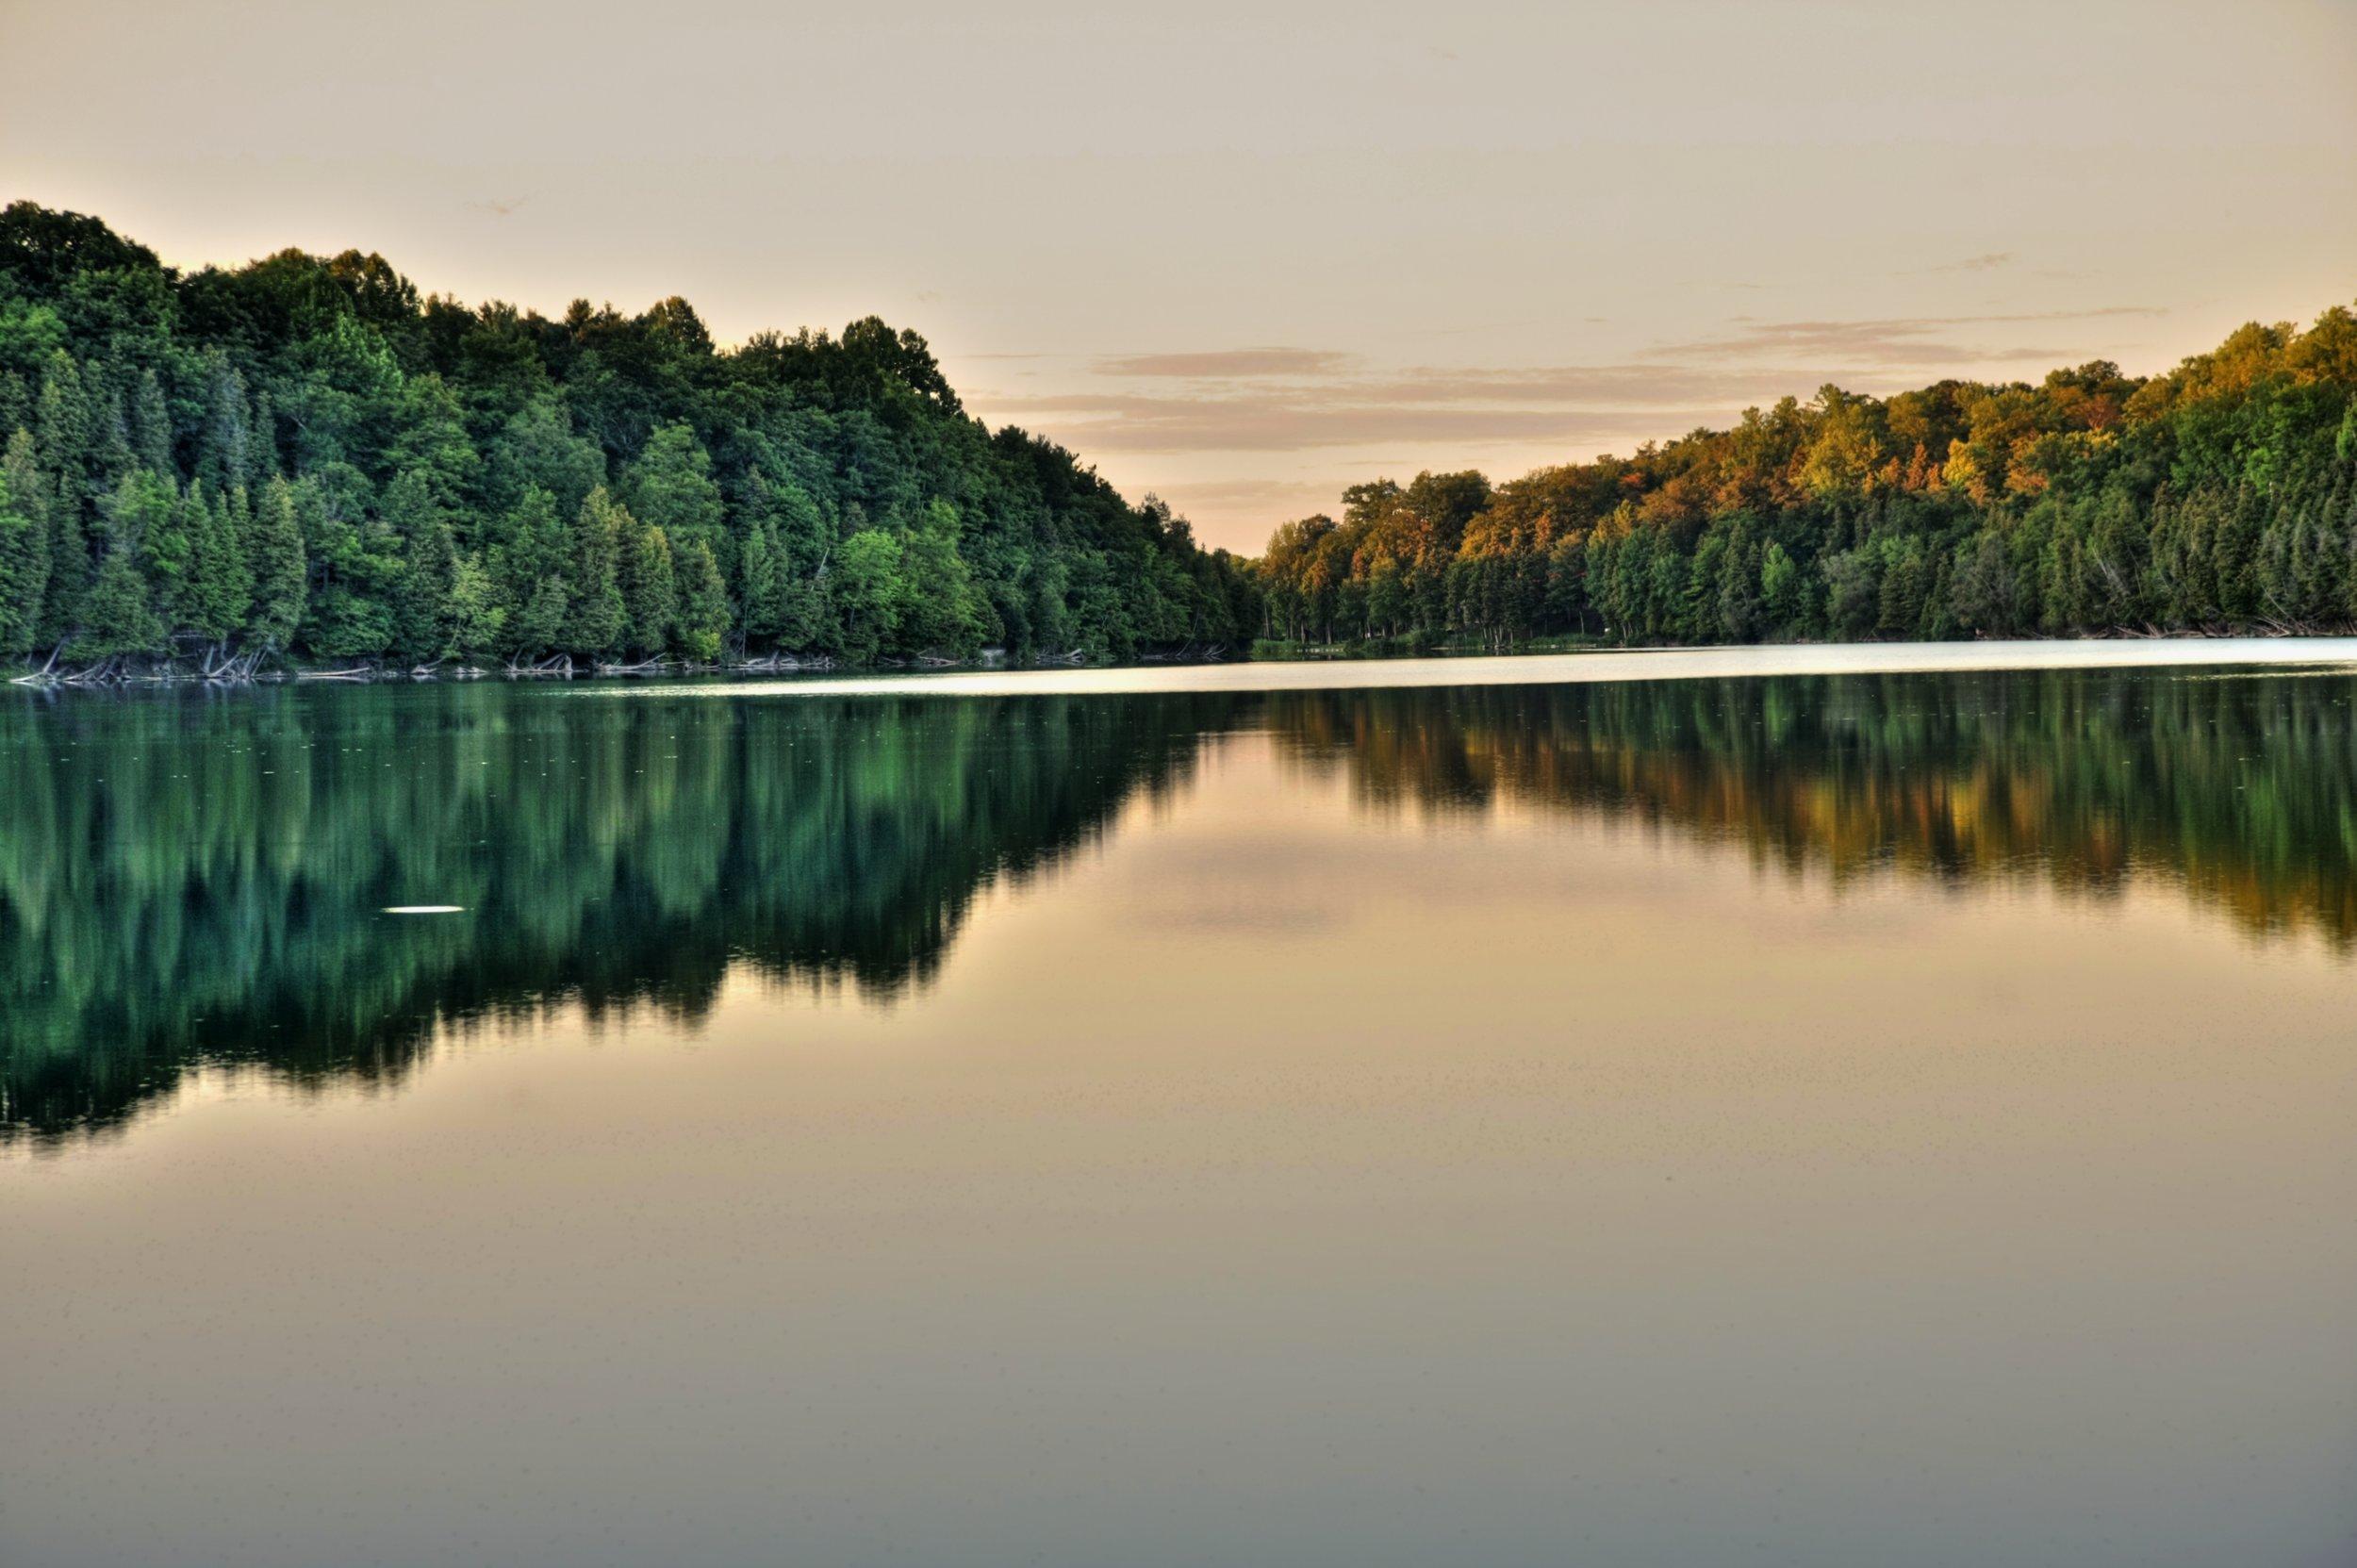 green+lakes+8+11+040_1_2_tonem-1432808764-O.jpg